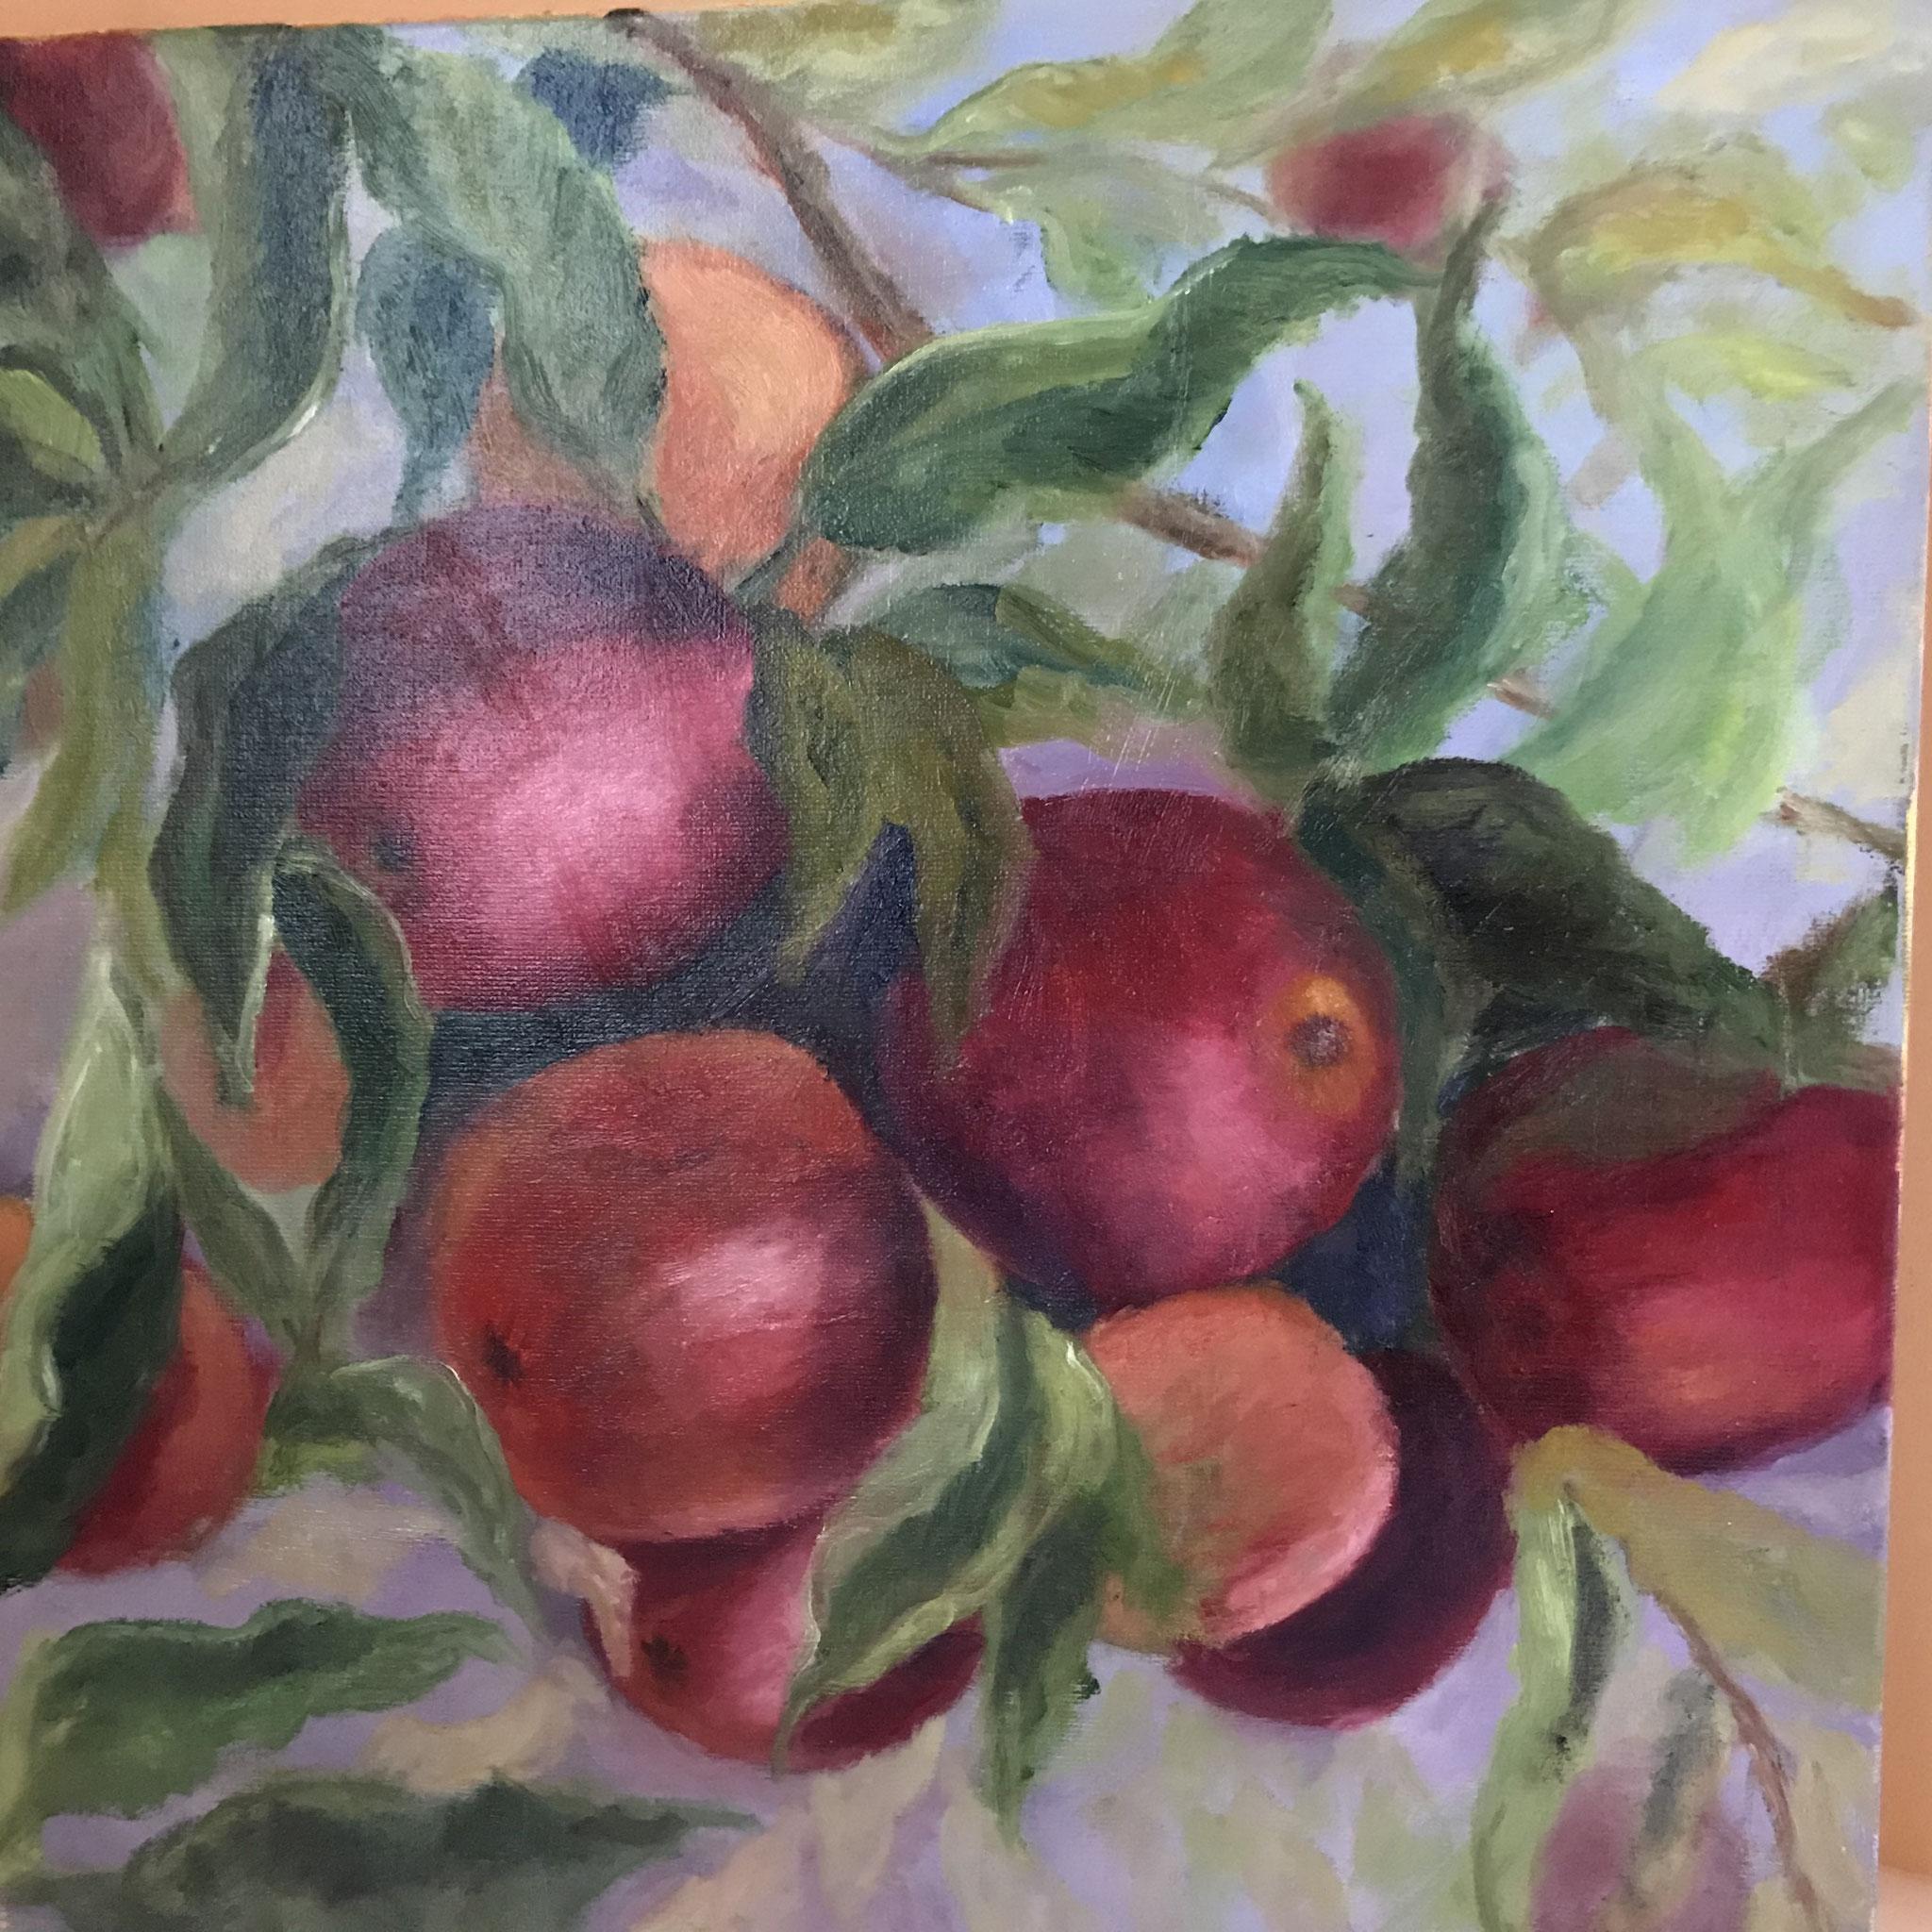 Grote paarsrode appels. 60x60cm. olie op linnen. 2018.